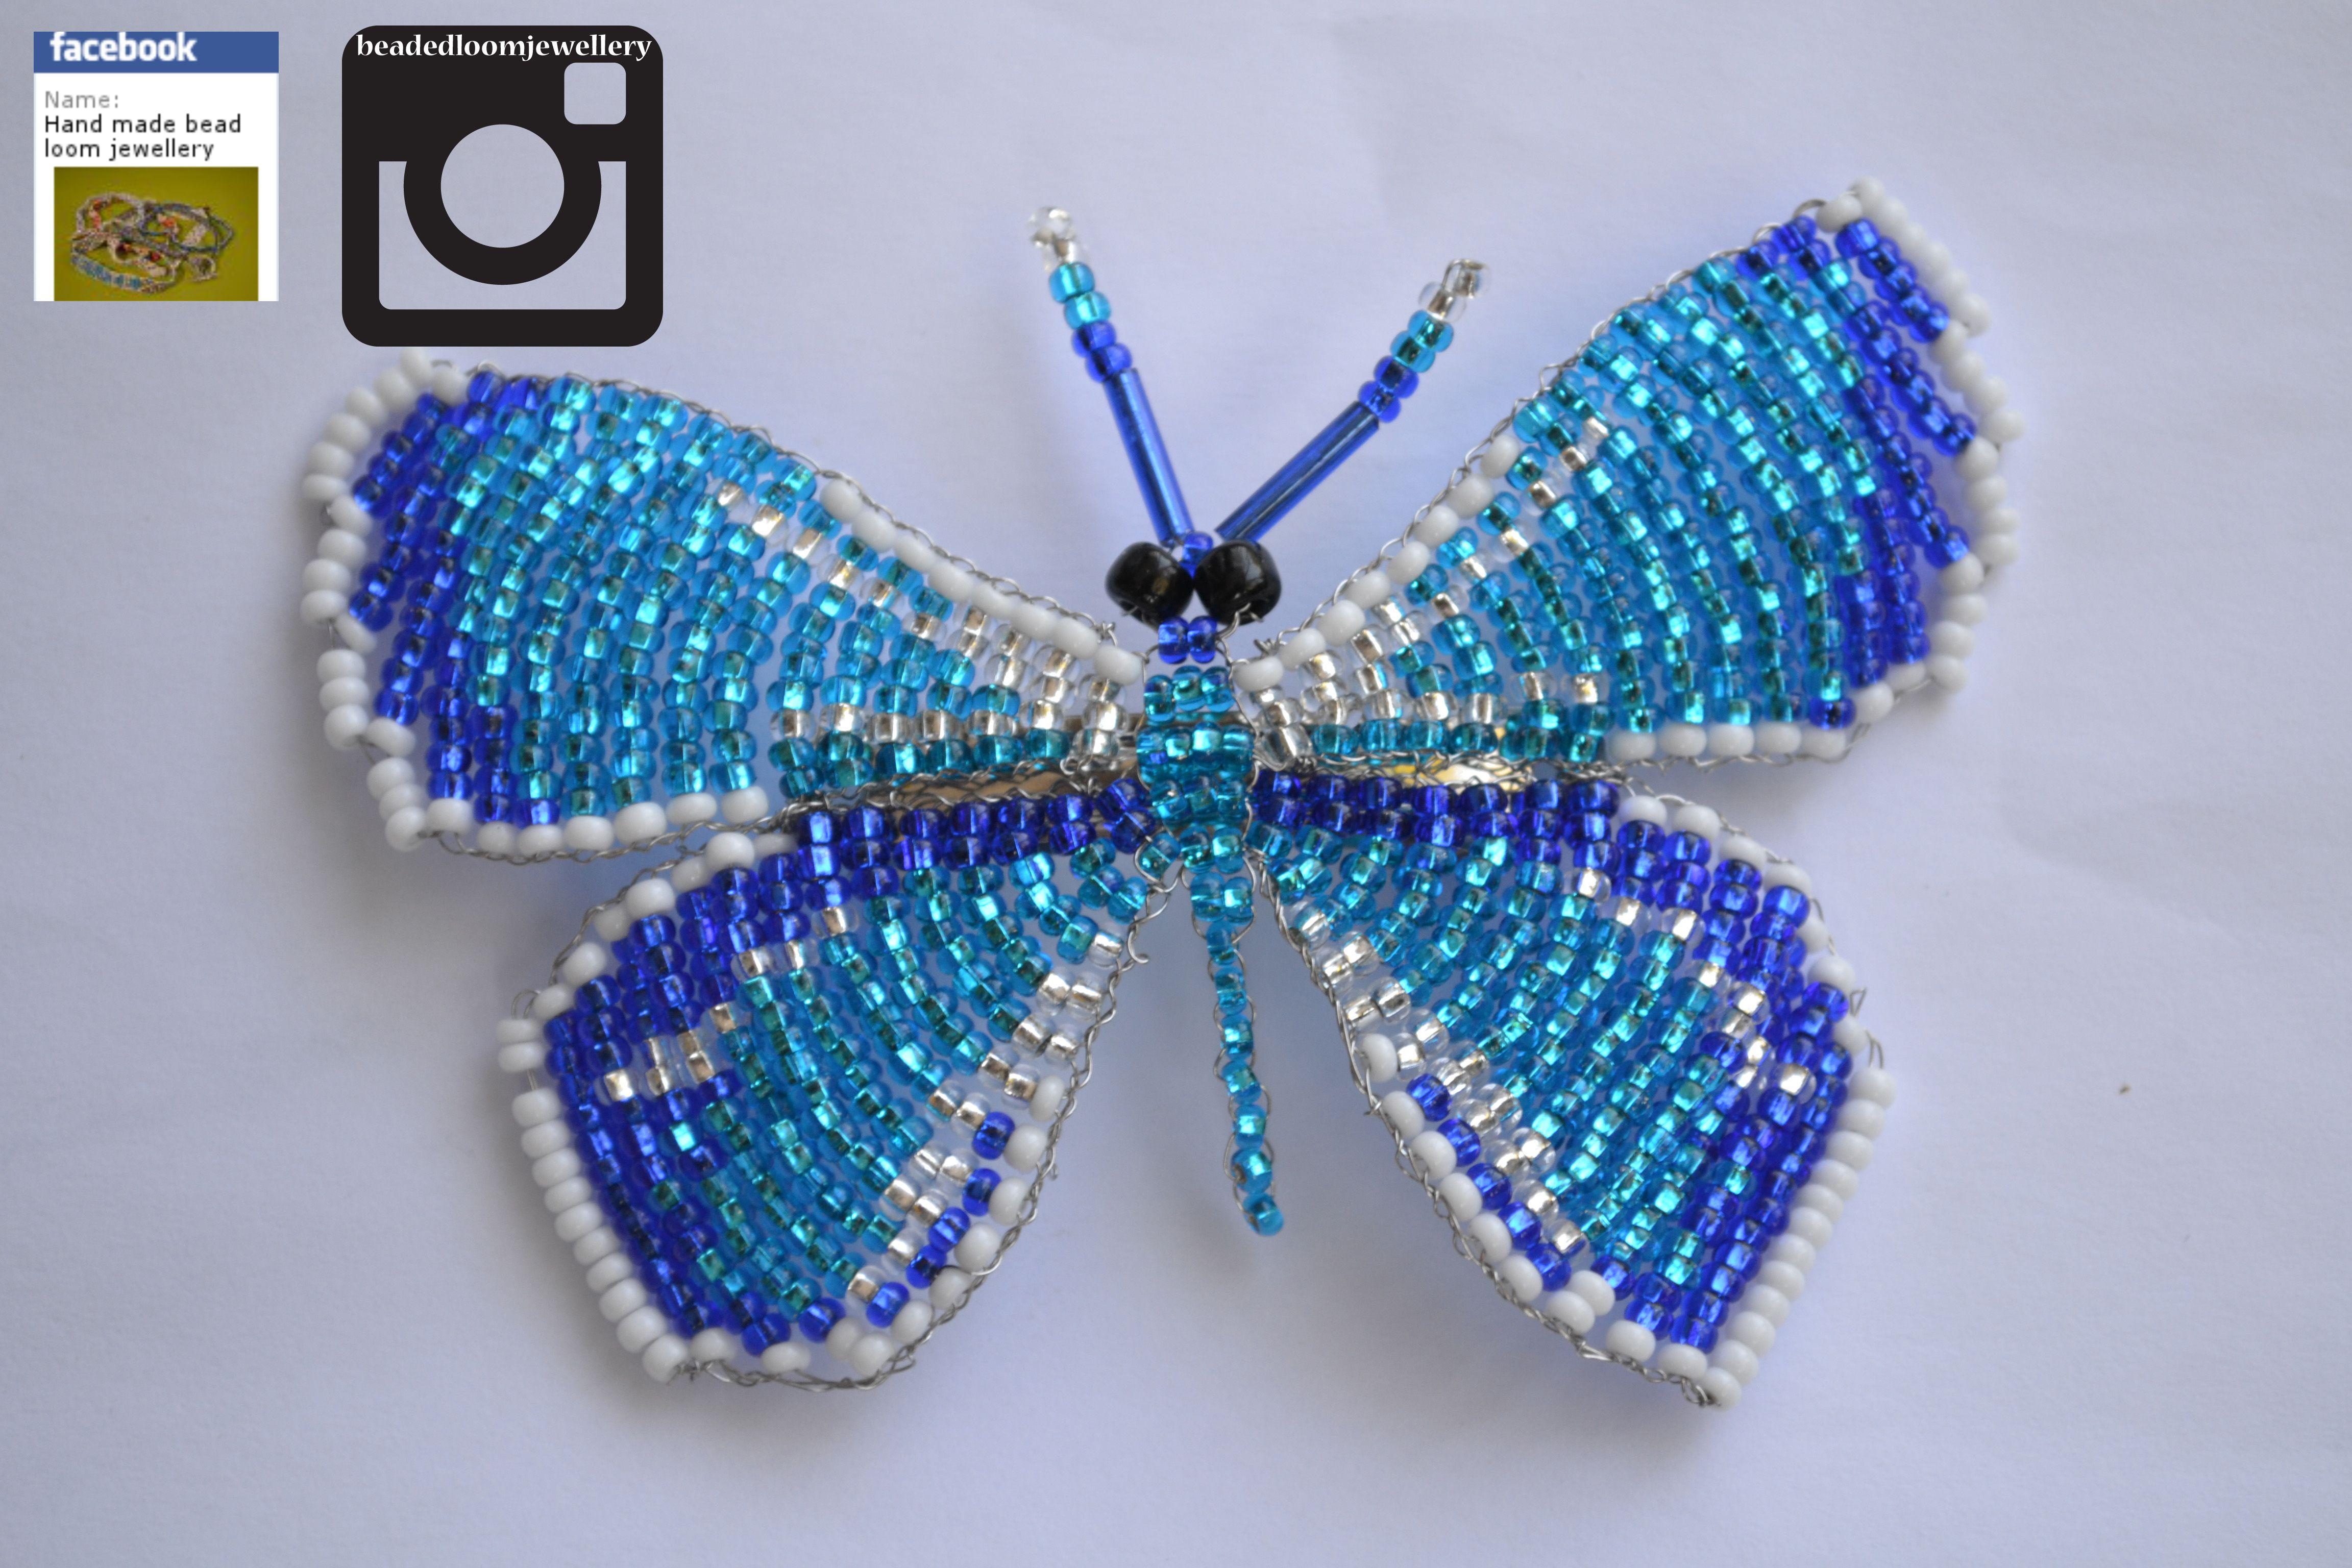 blue butterfly hair clip £6.50 order yours now! @ https://www.facebook.com/HandMadeBeadLoomJewellery #fashion #bracelet #jewellery #buy #handmade #round #3dbeading